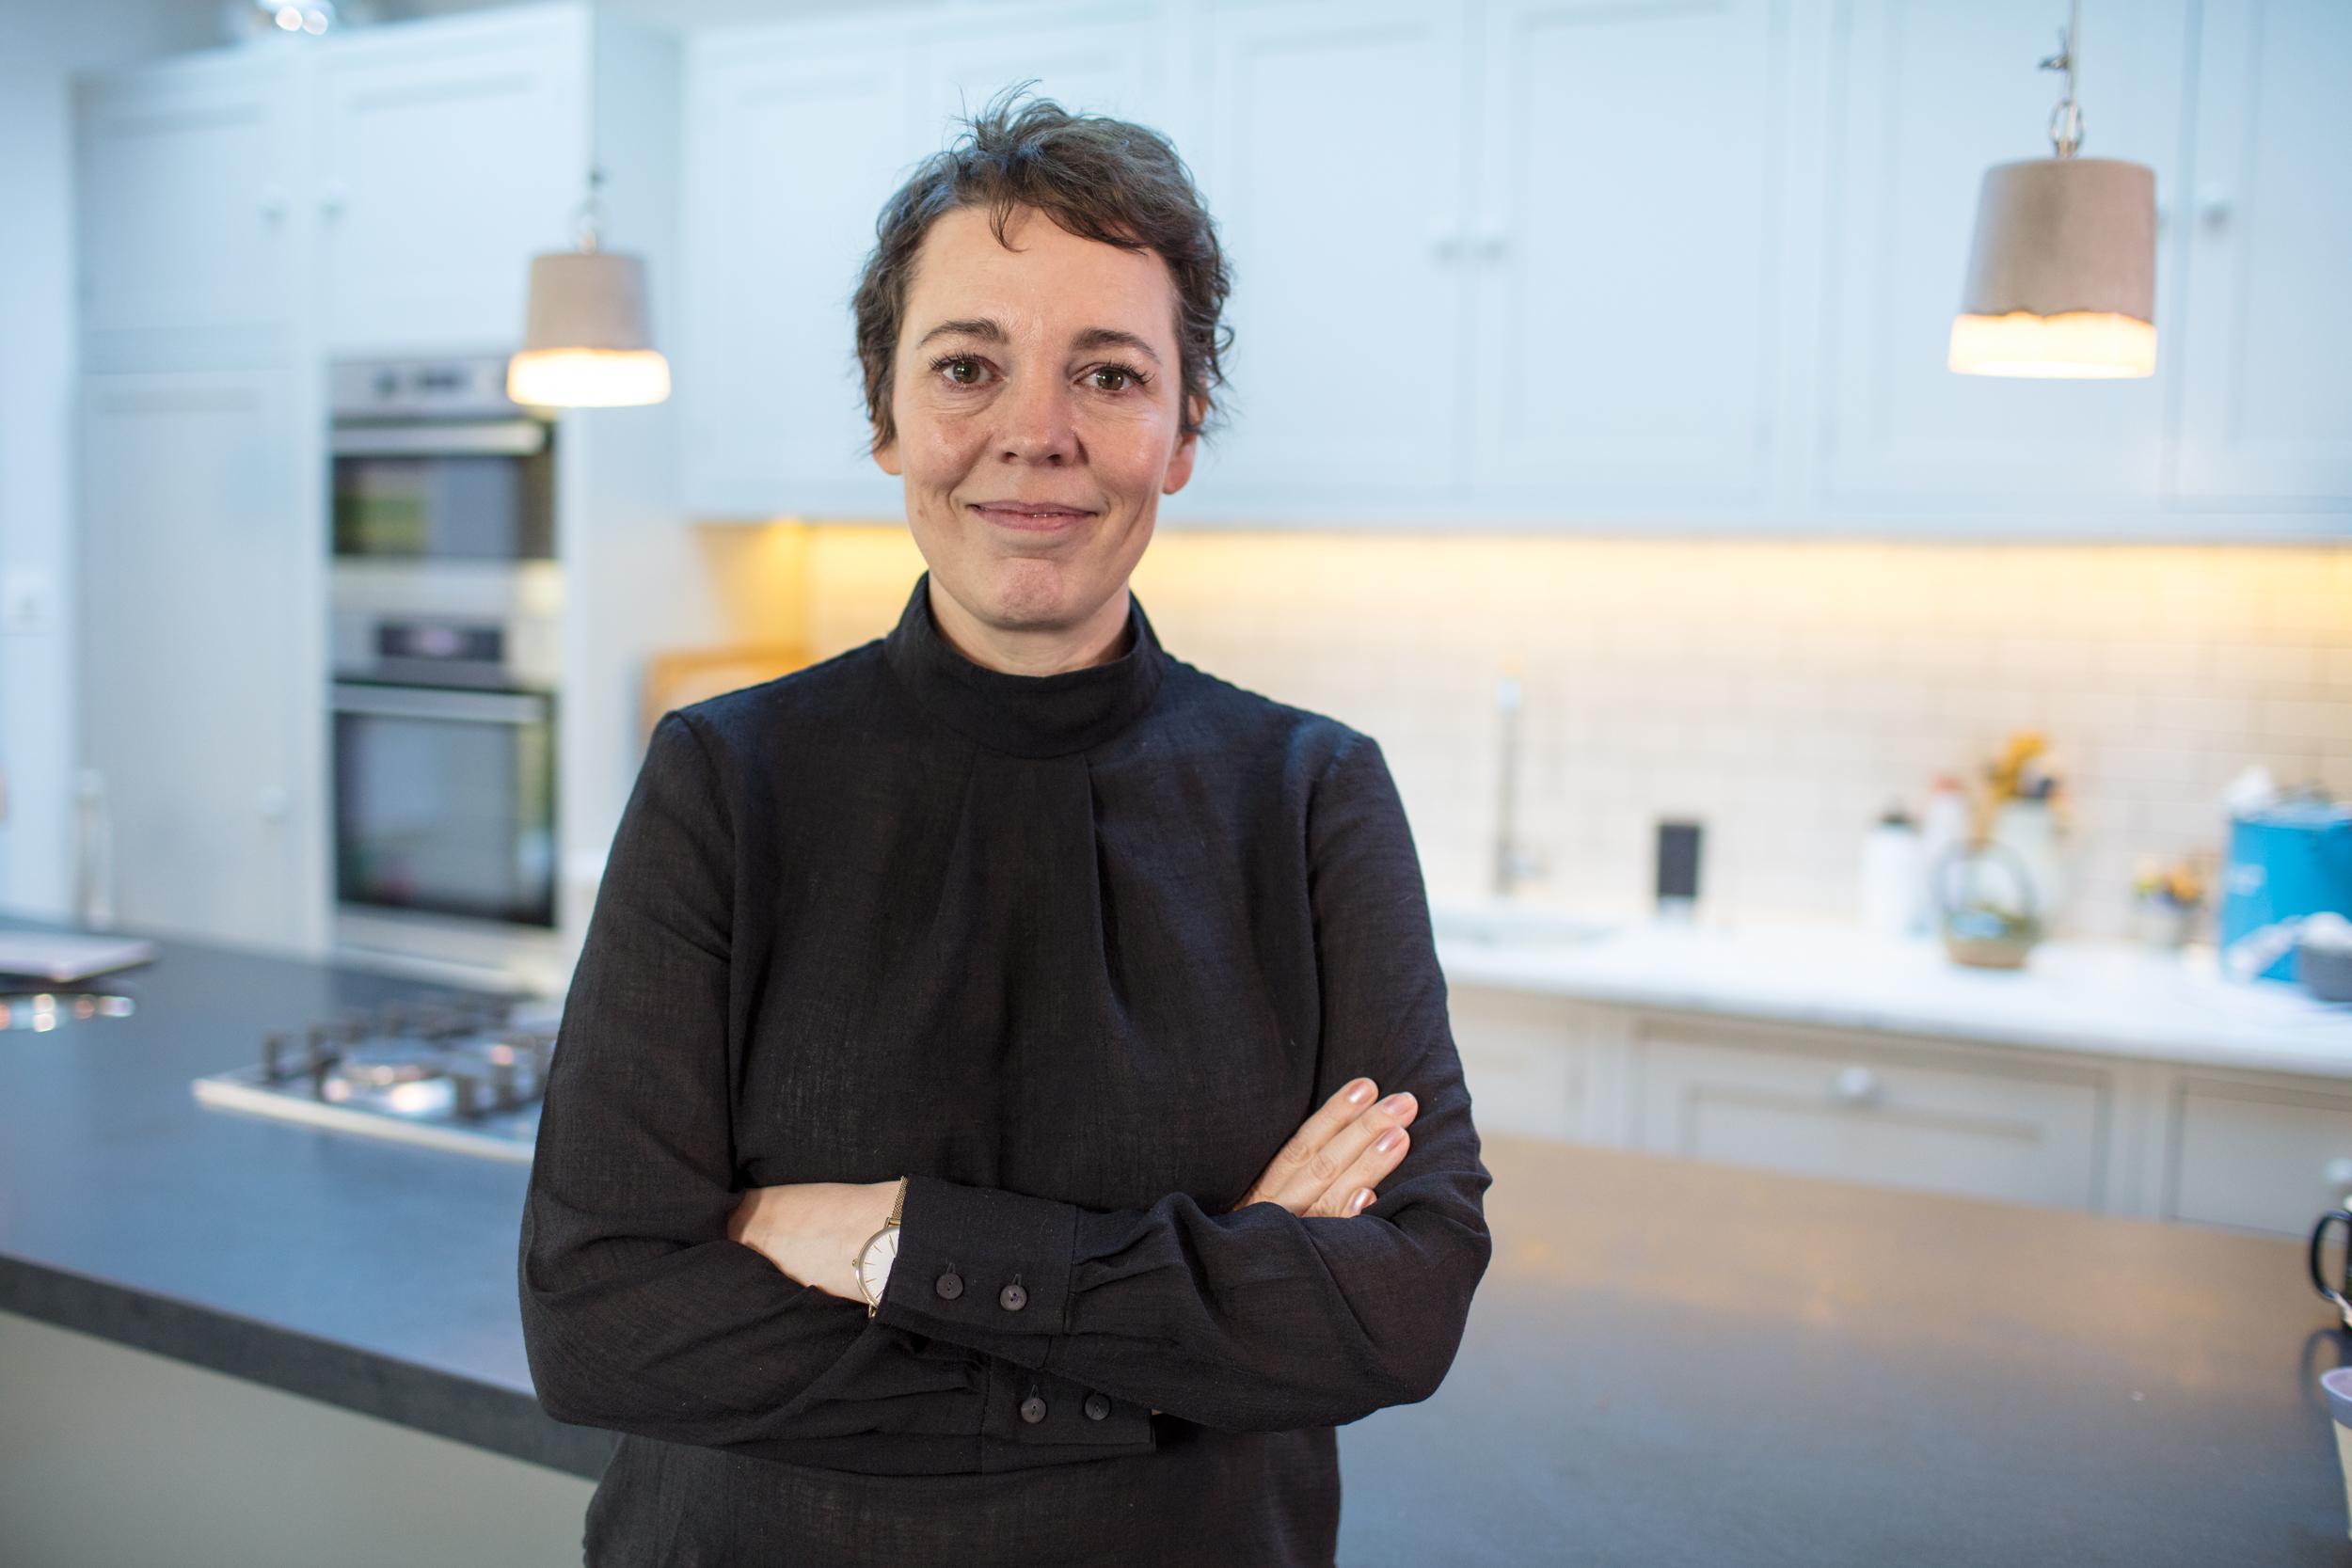 Olivia Colman in her kitchen